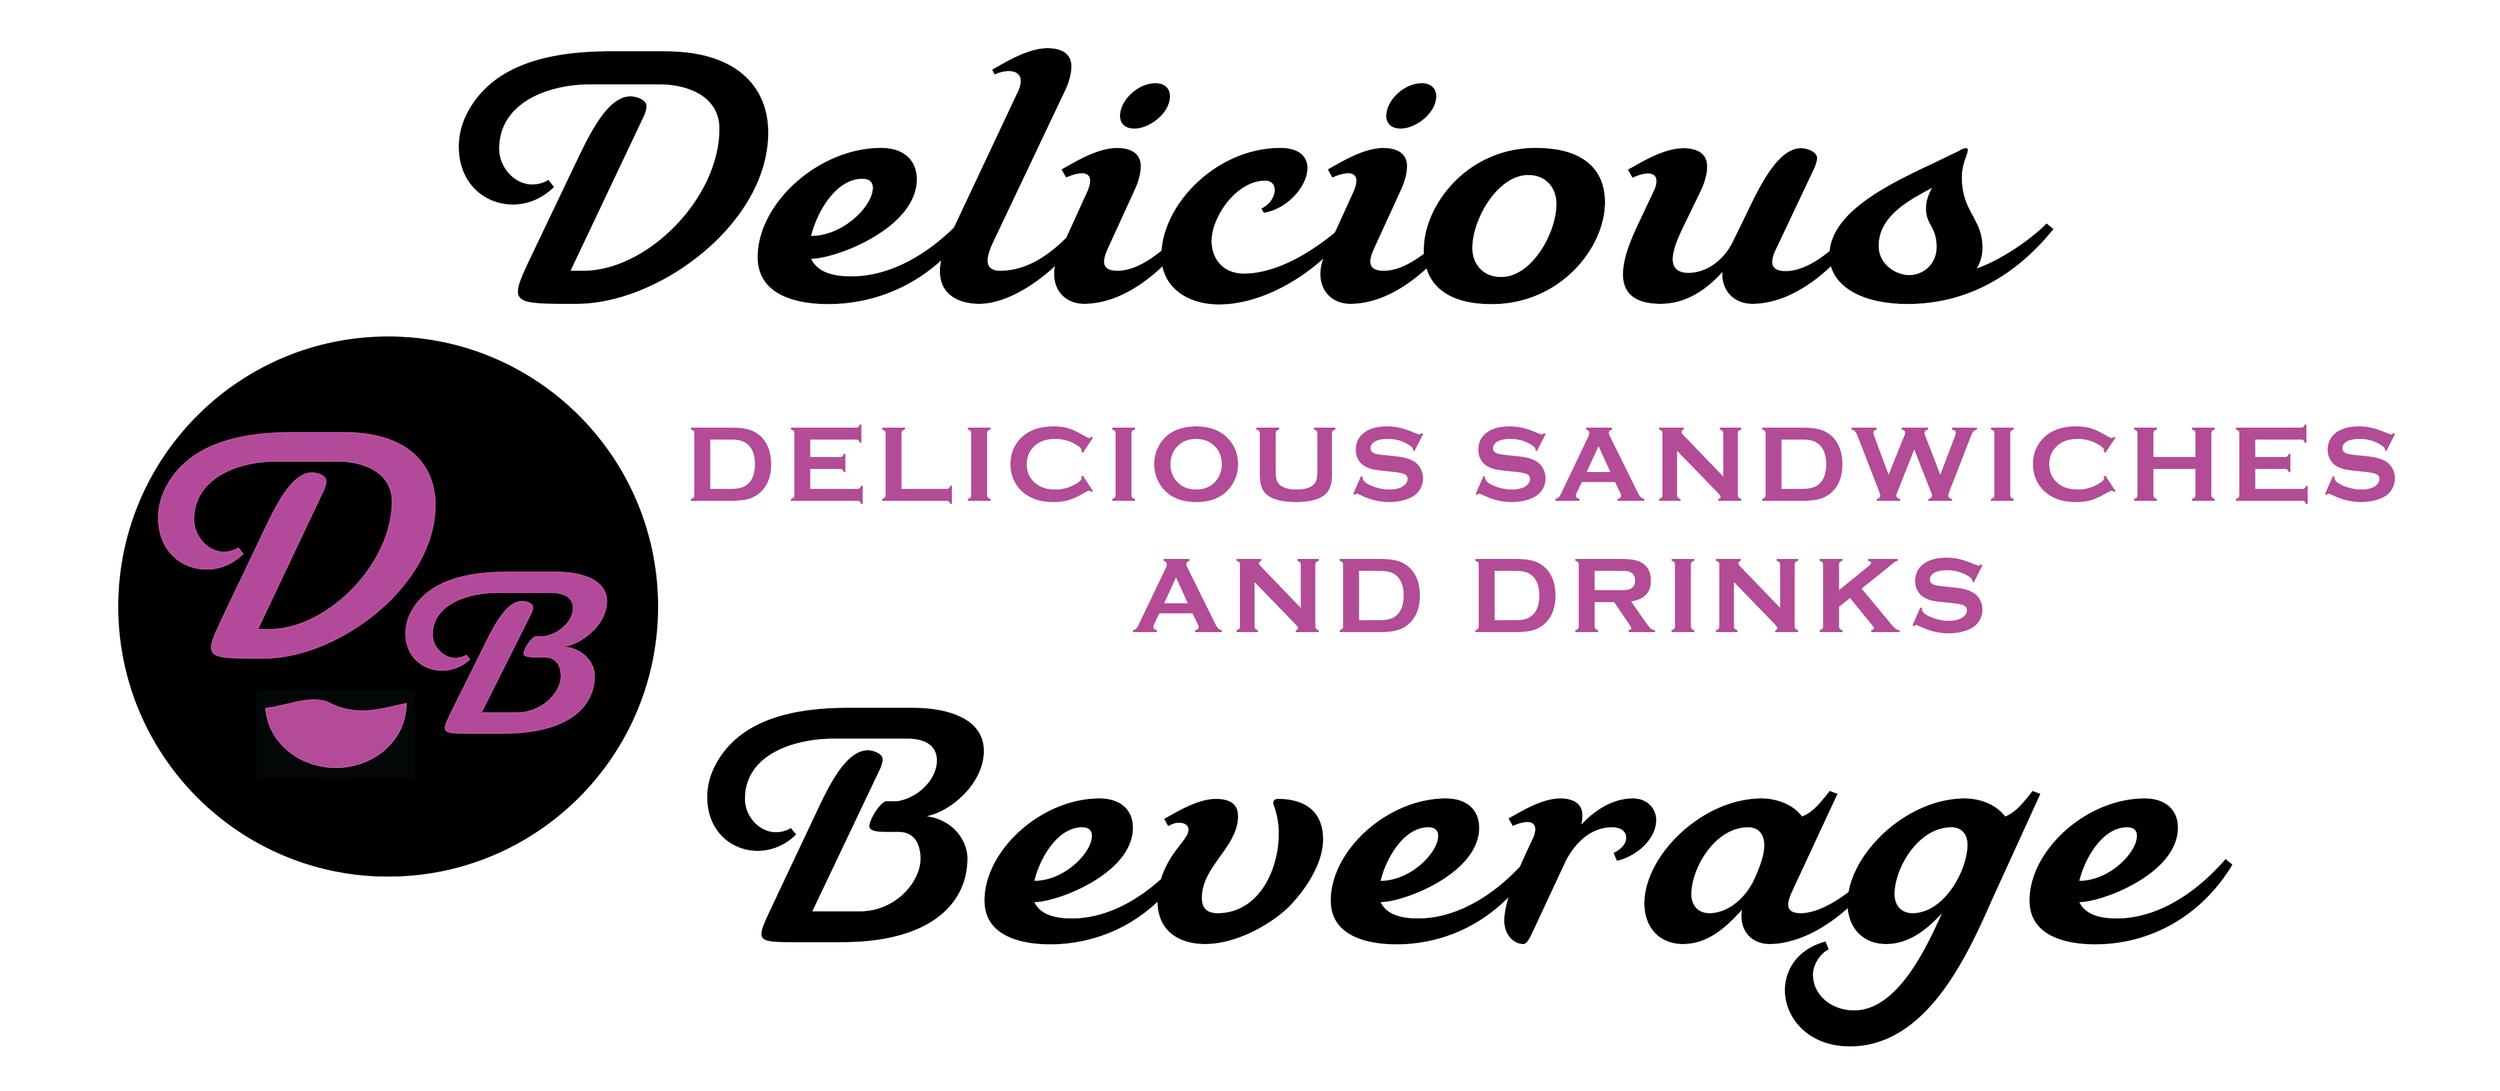 Delicious Beverage_SVVegFest_2019_Vendor.png